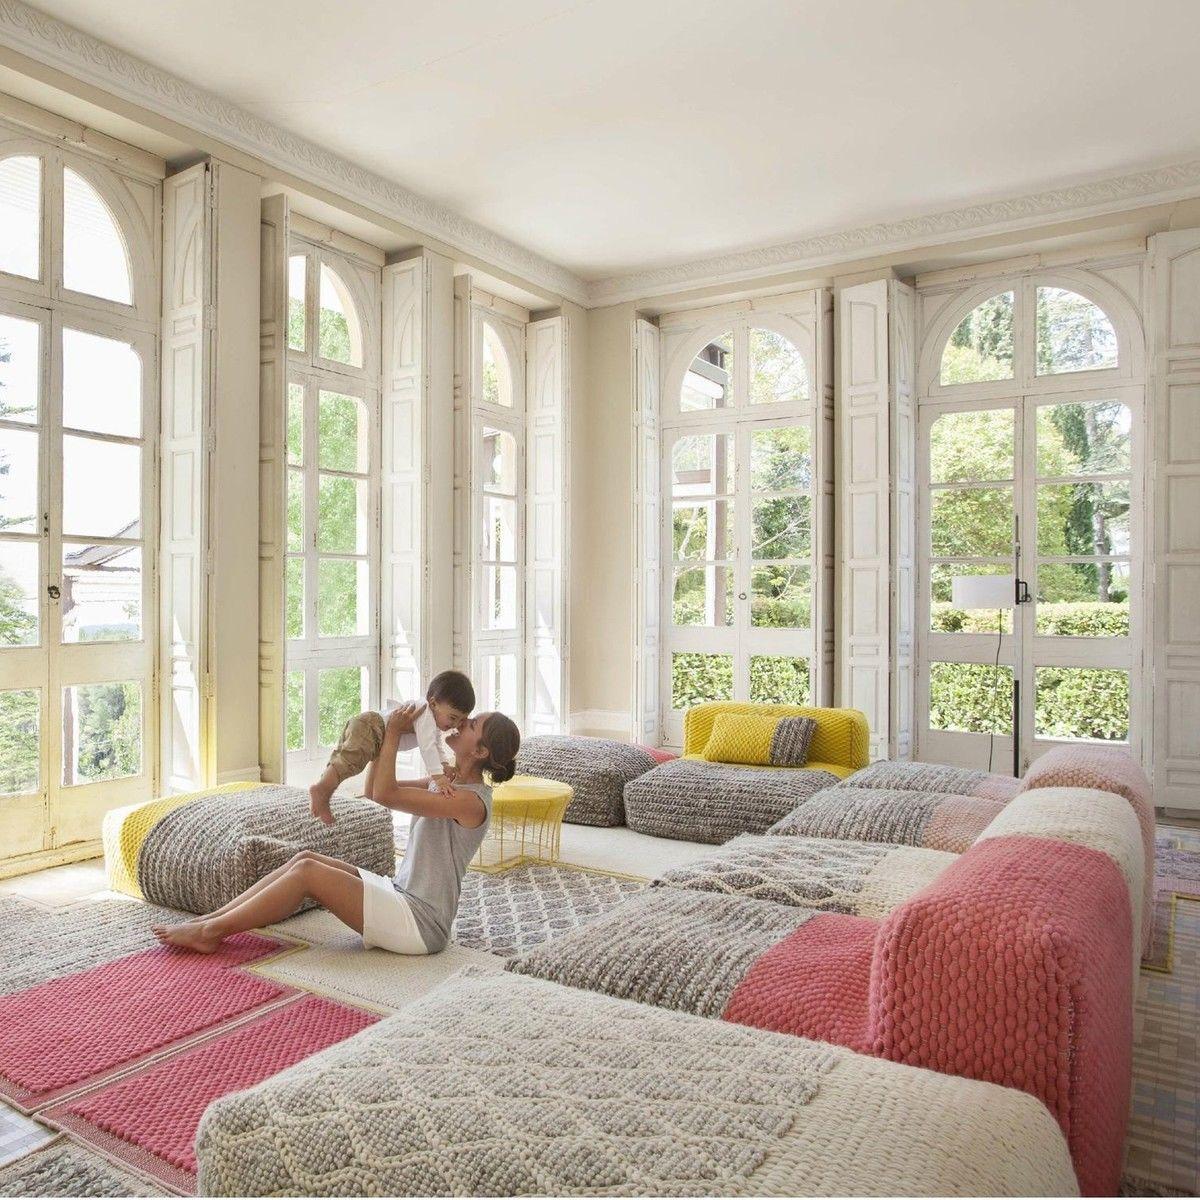 mangas space modules pouf gan. Black Bedroom Furniture Sets. Home Design Ideas